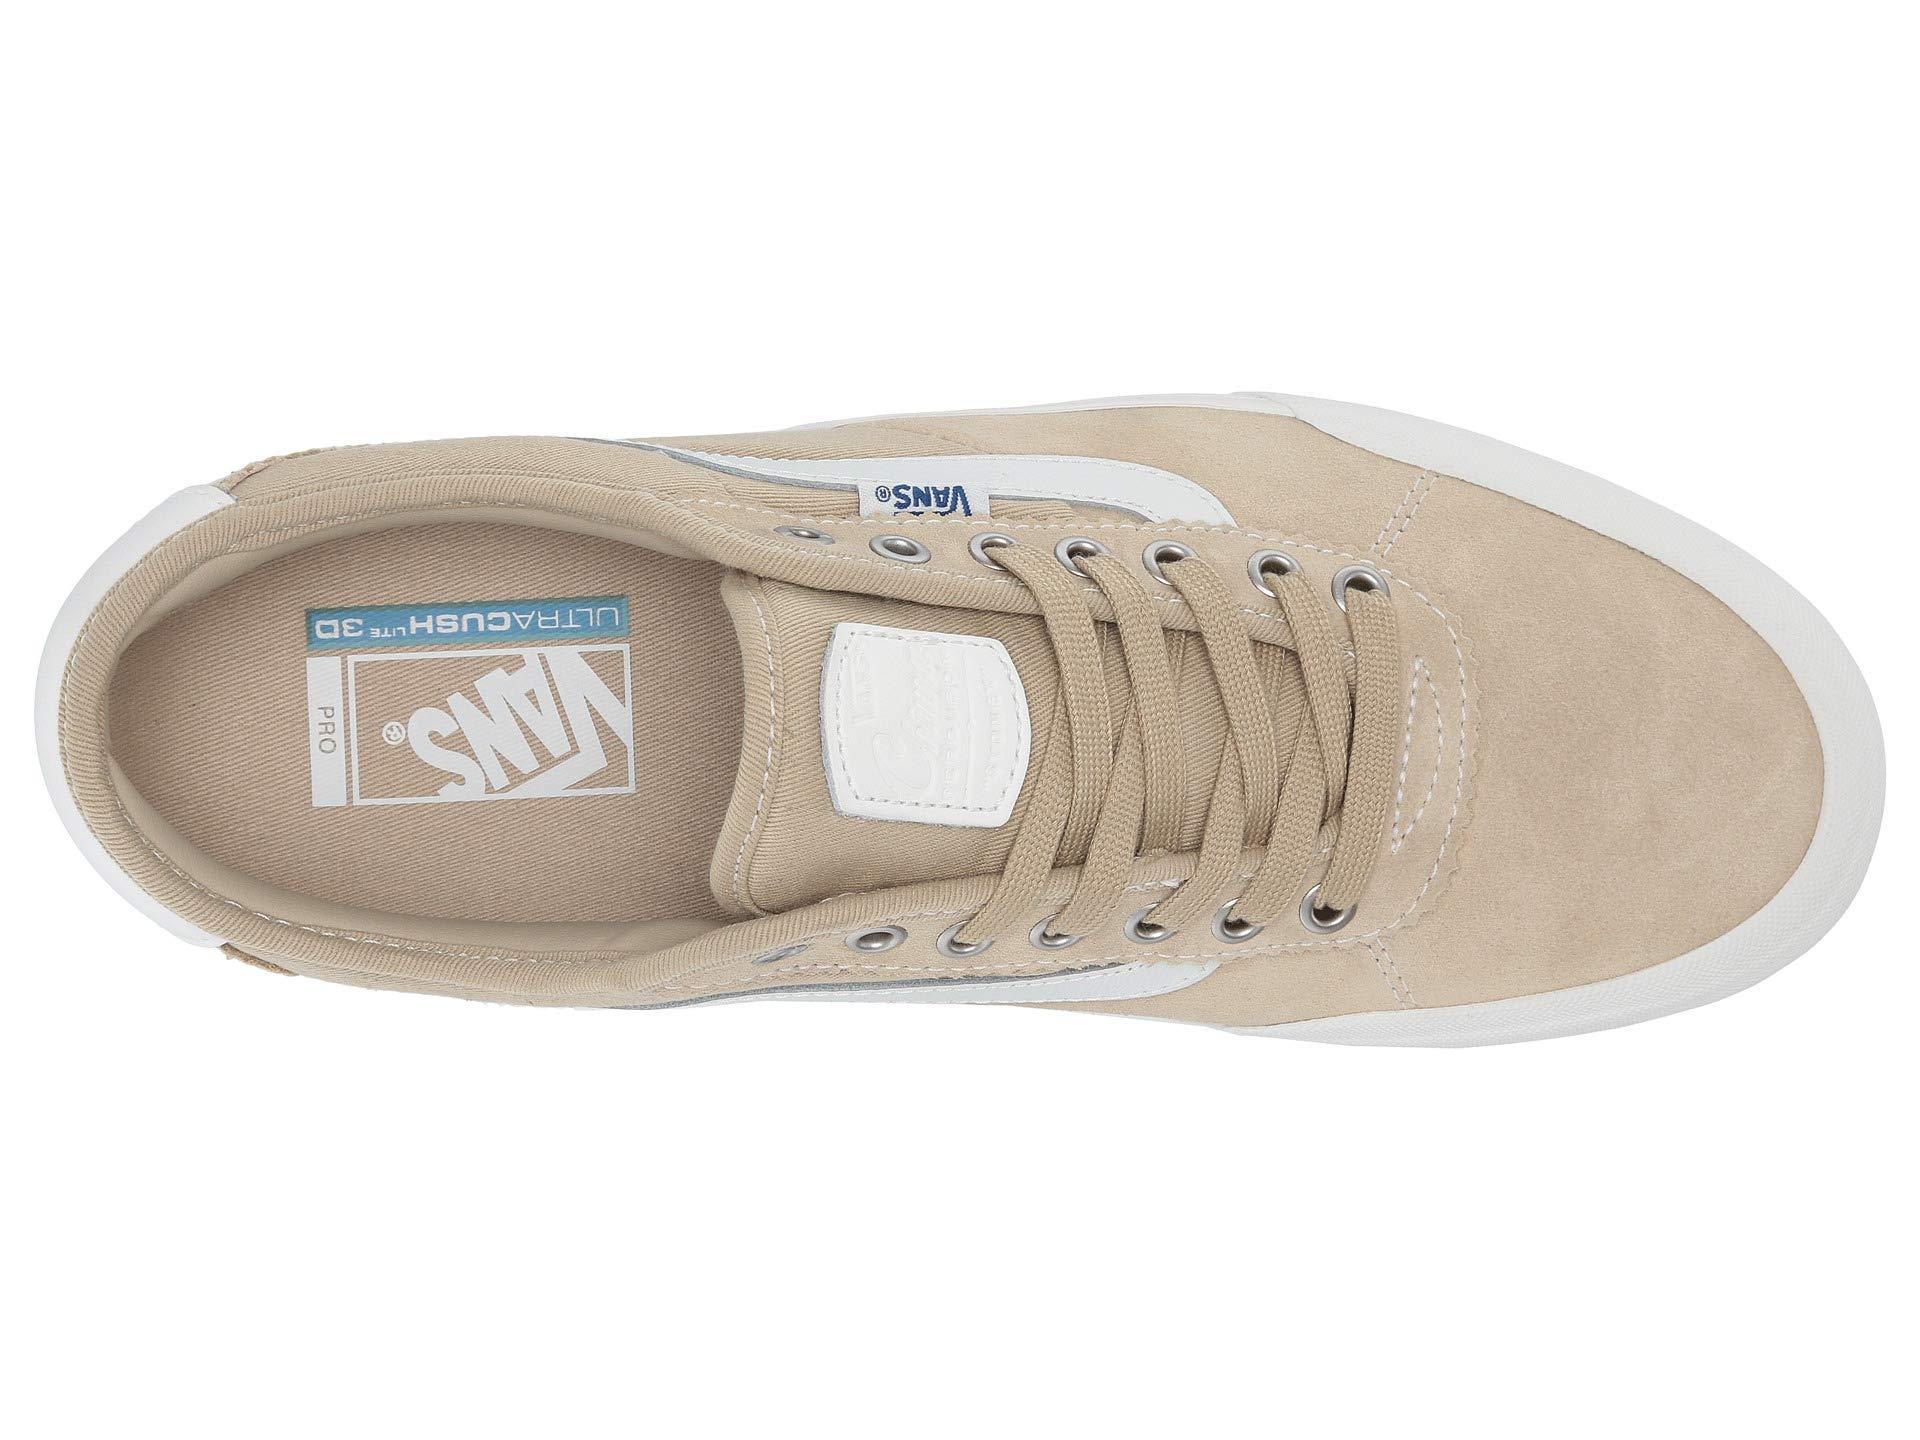 53d54110a4b Vans - White Chima Pro 2 ((retro) Slate Green) Men s Skate Shoes. View  fullscreen